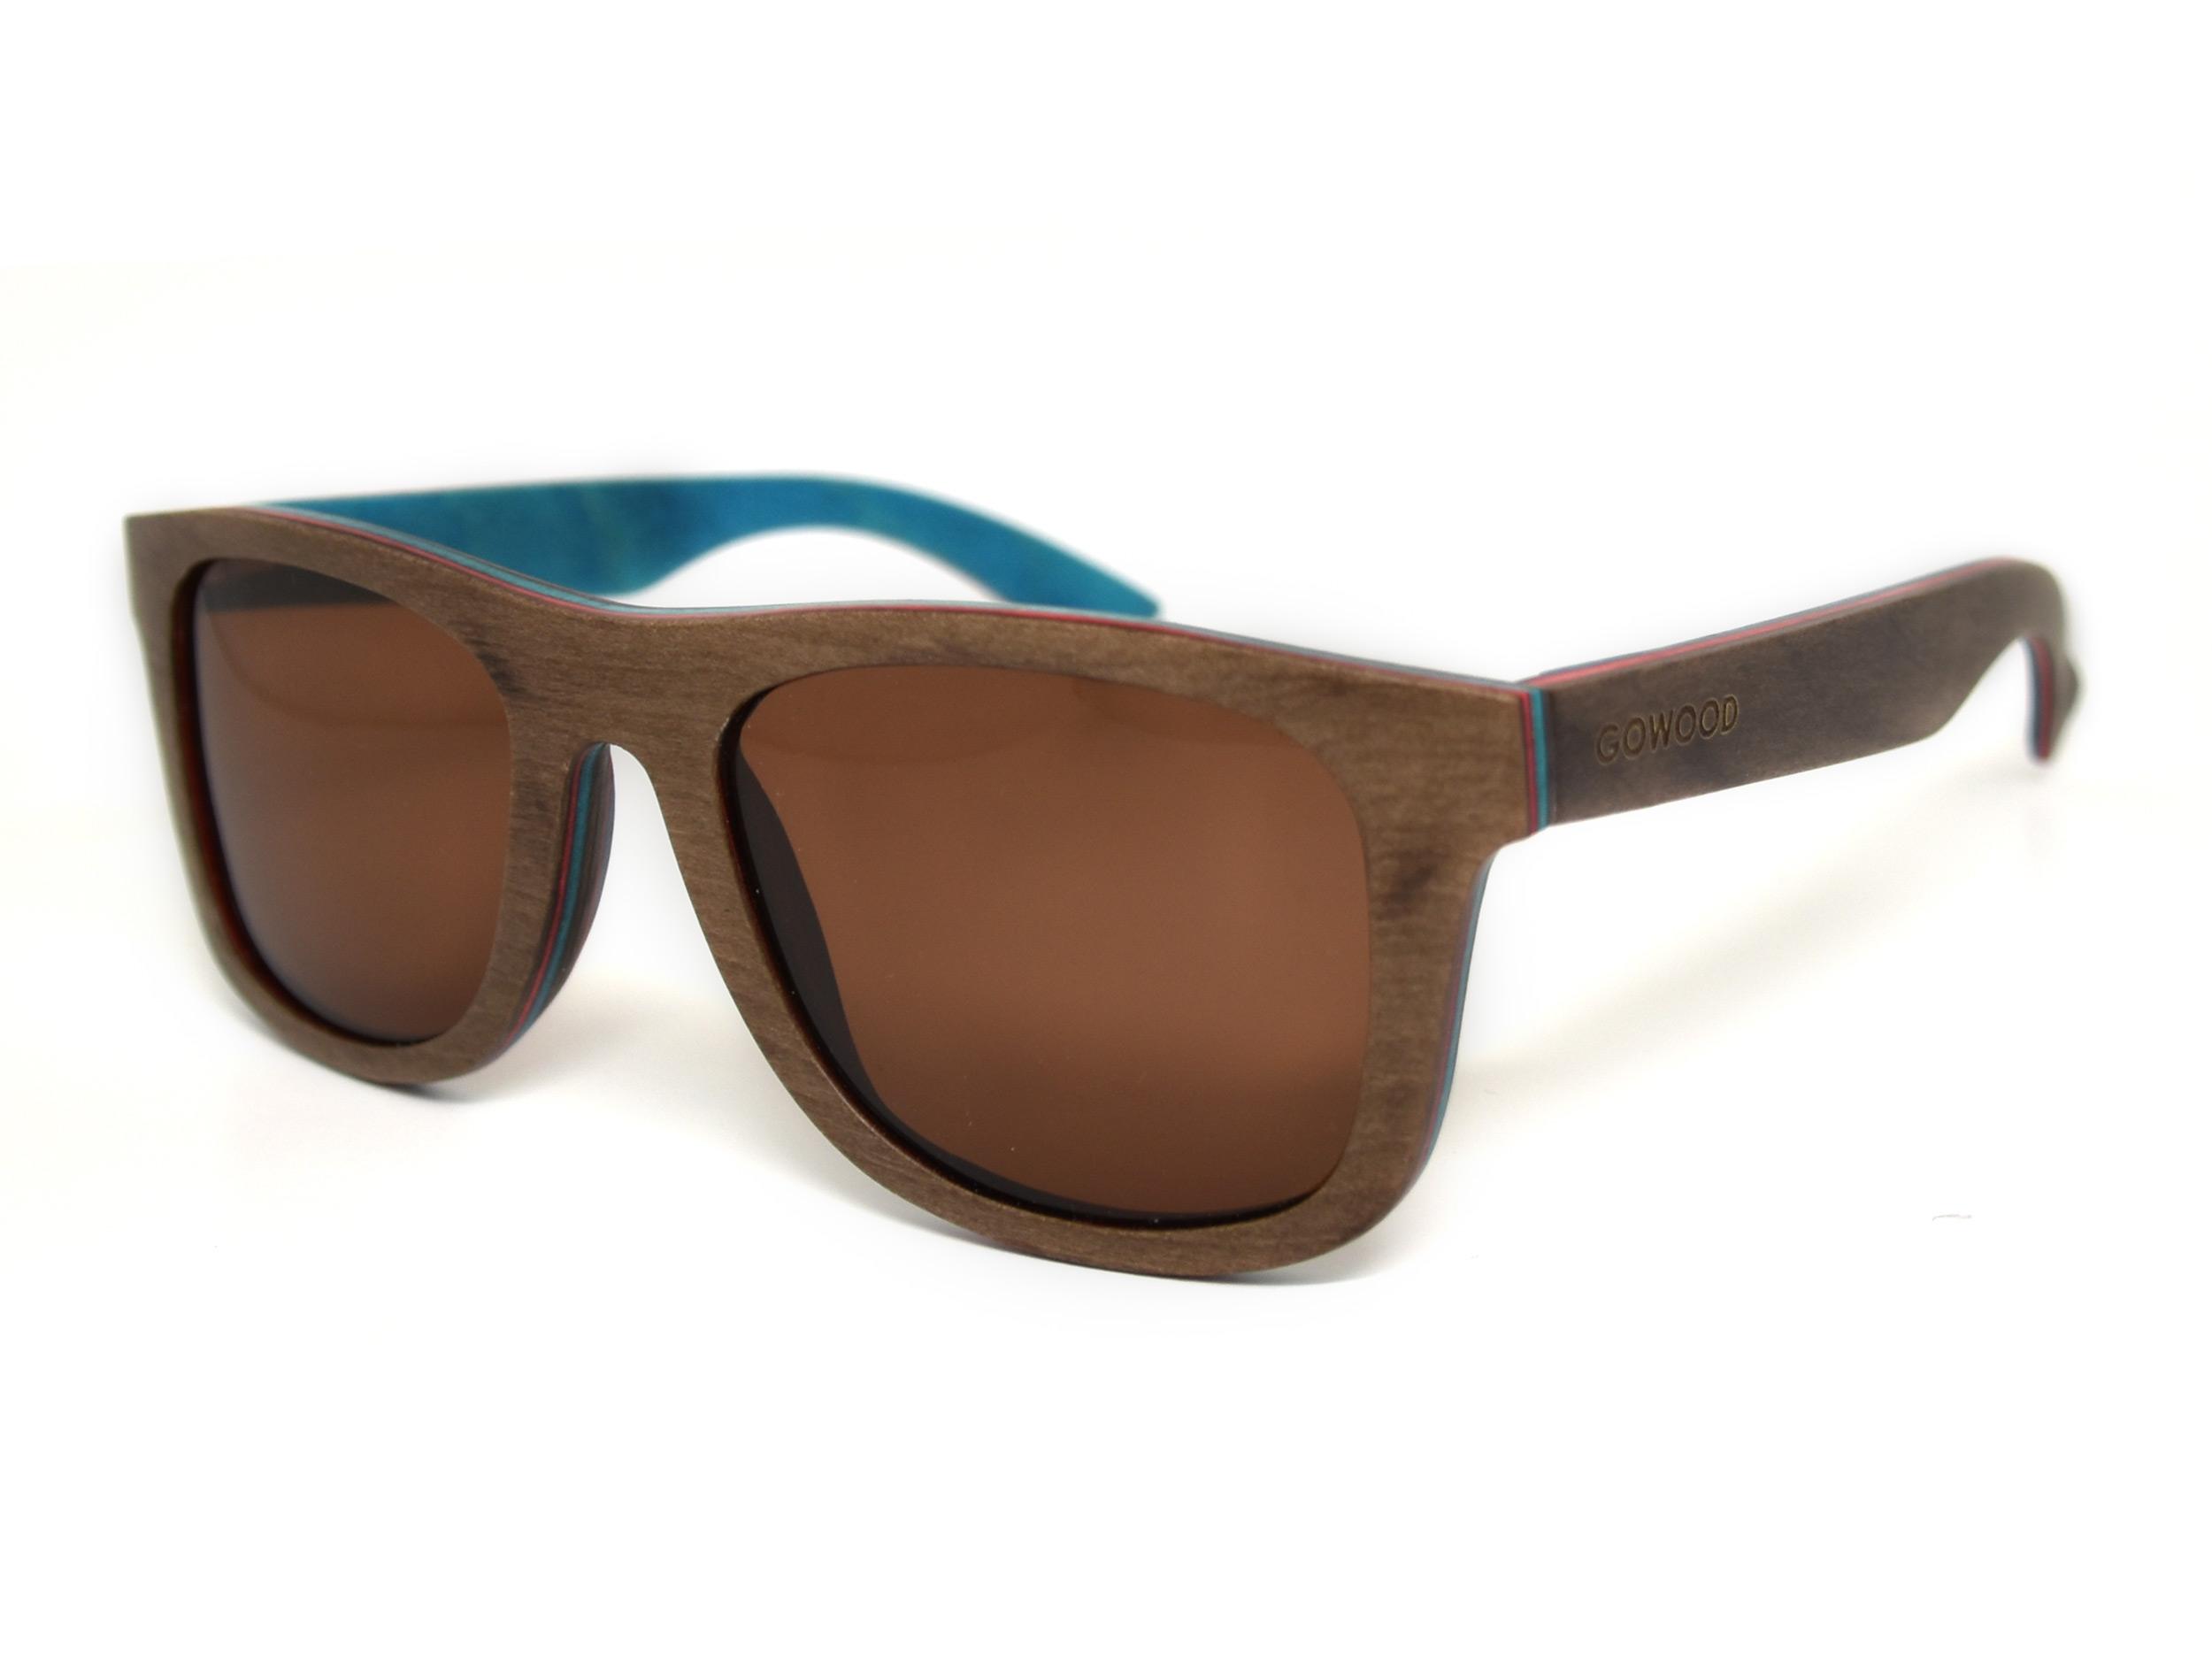 Skateboard wood sunglasses Toulouse angle